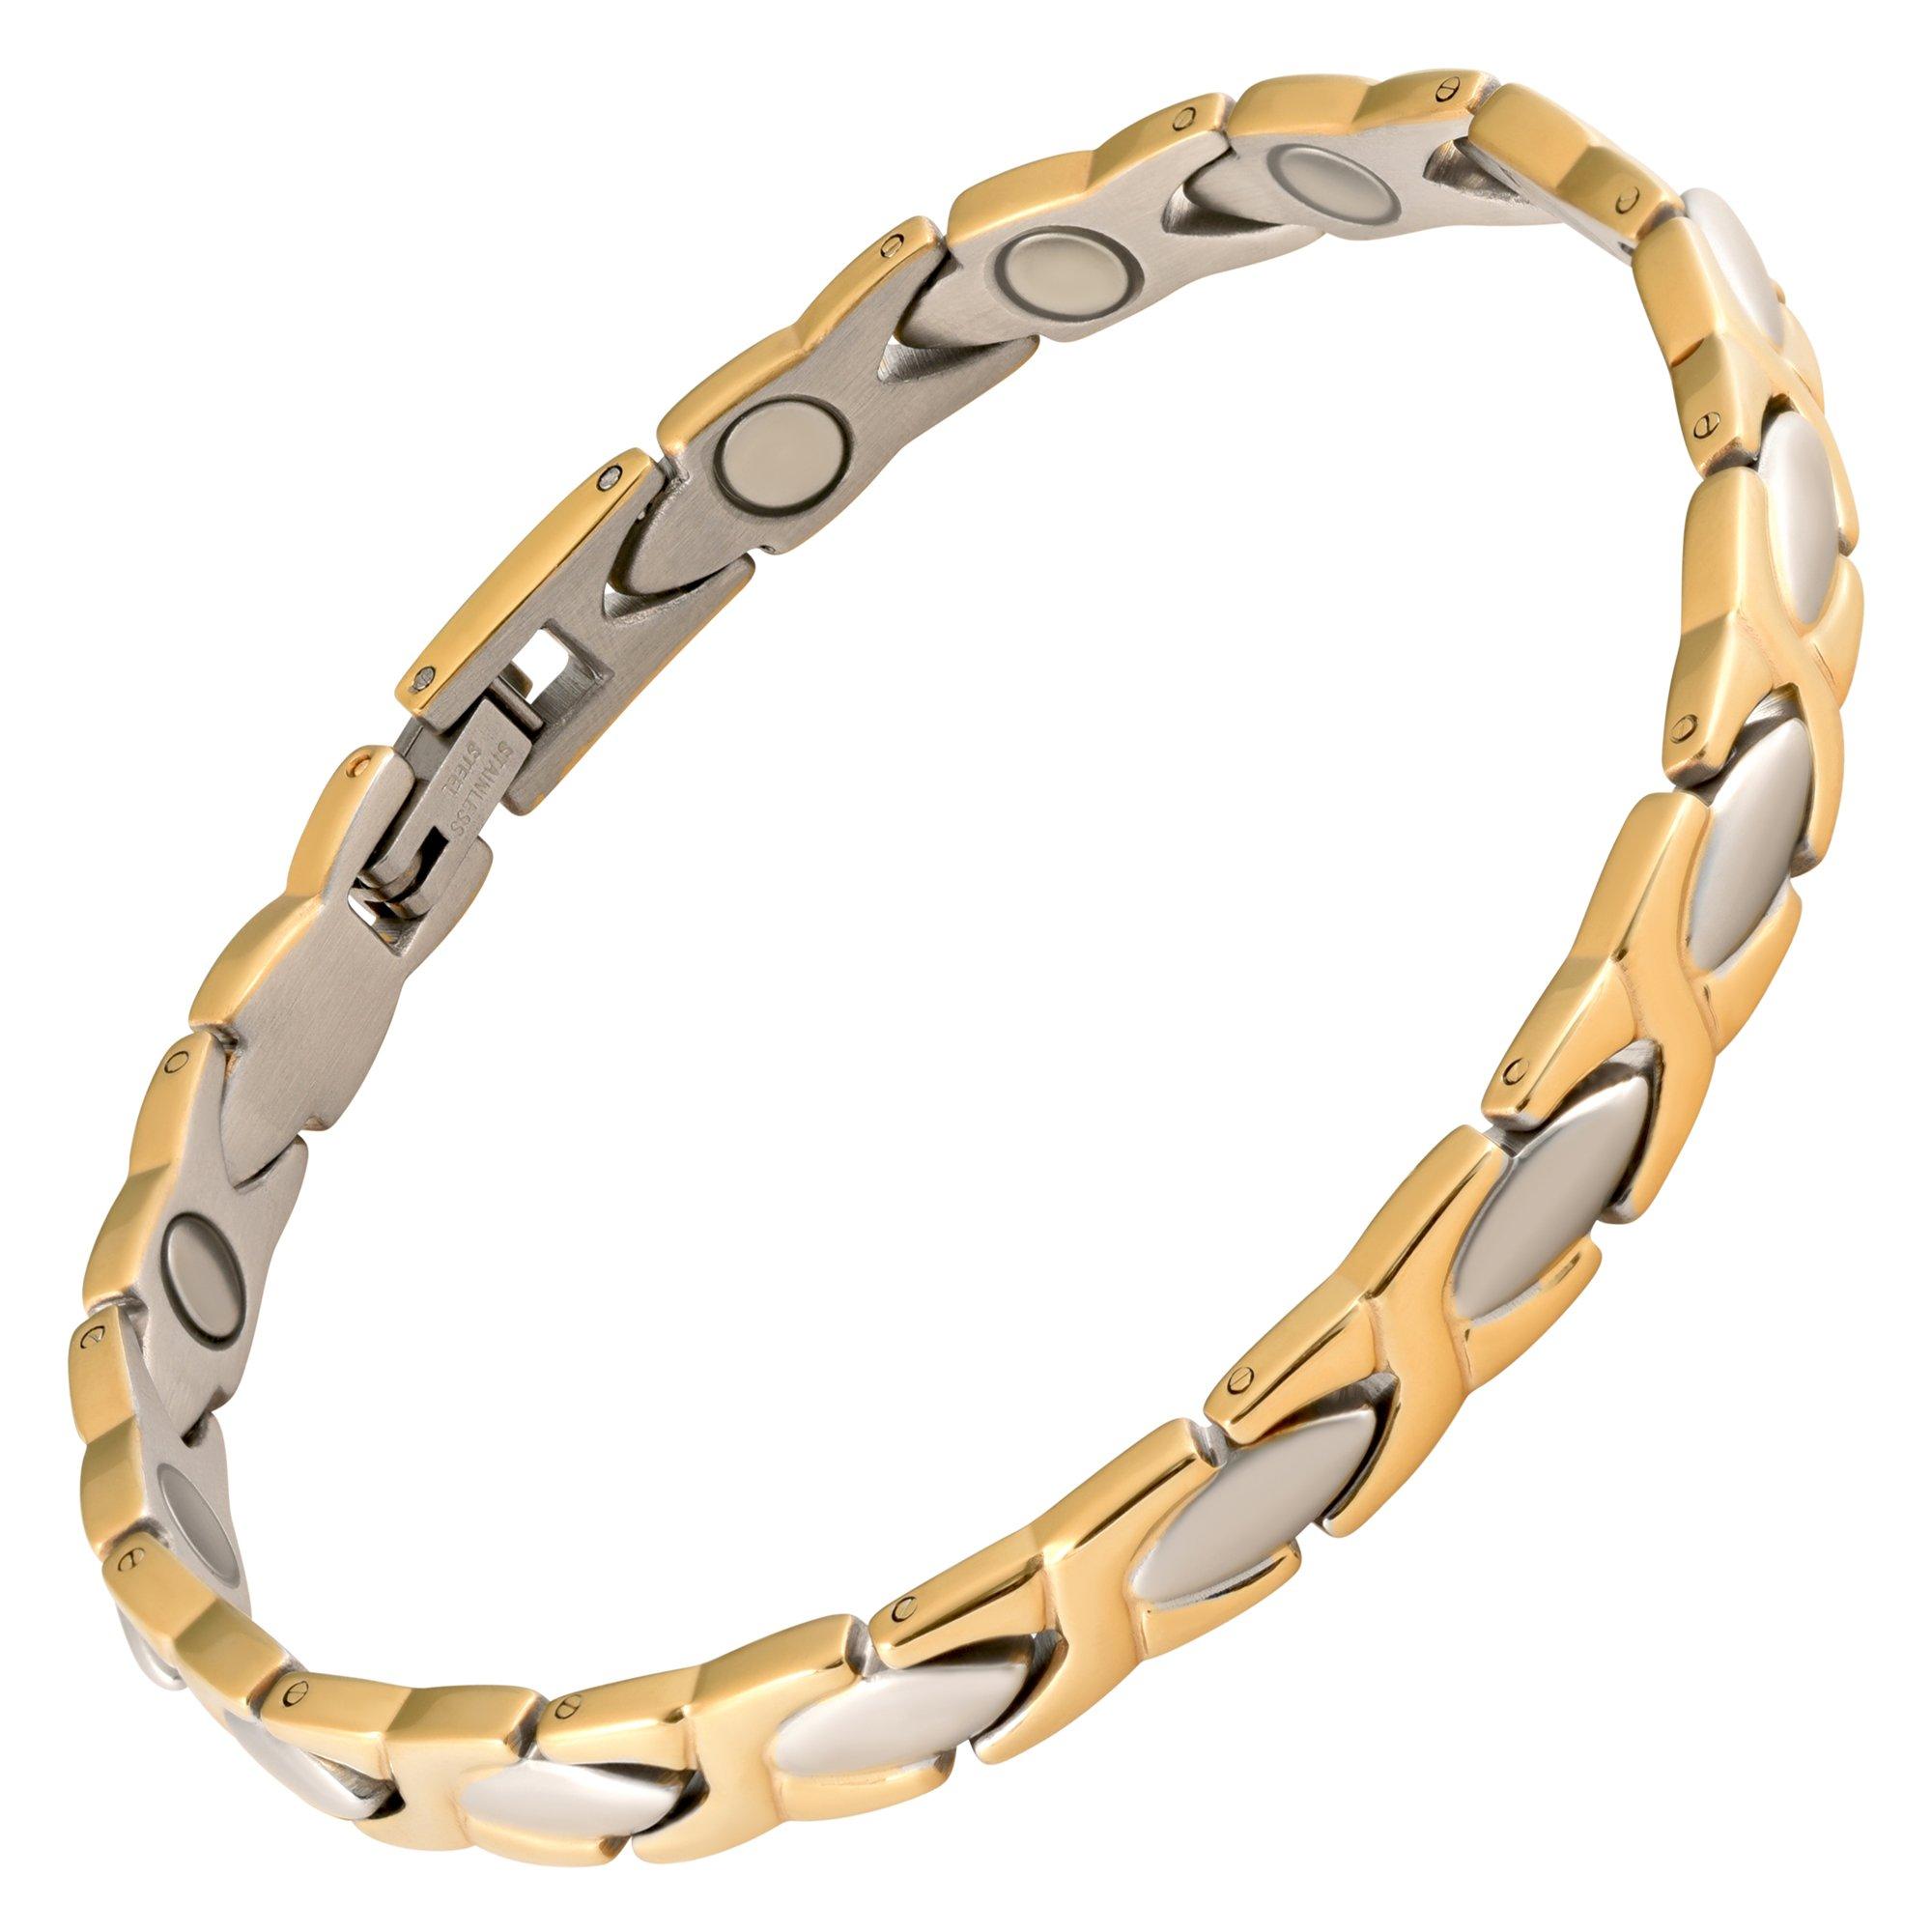 Fashion week Bracelet Power magnetic for lady